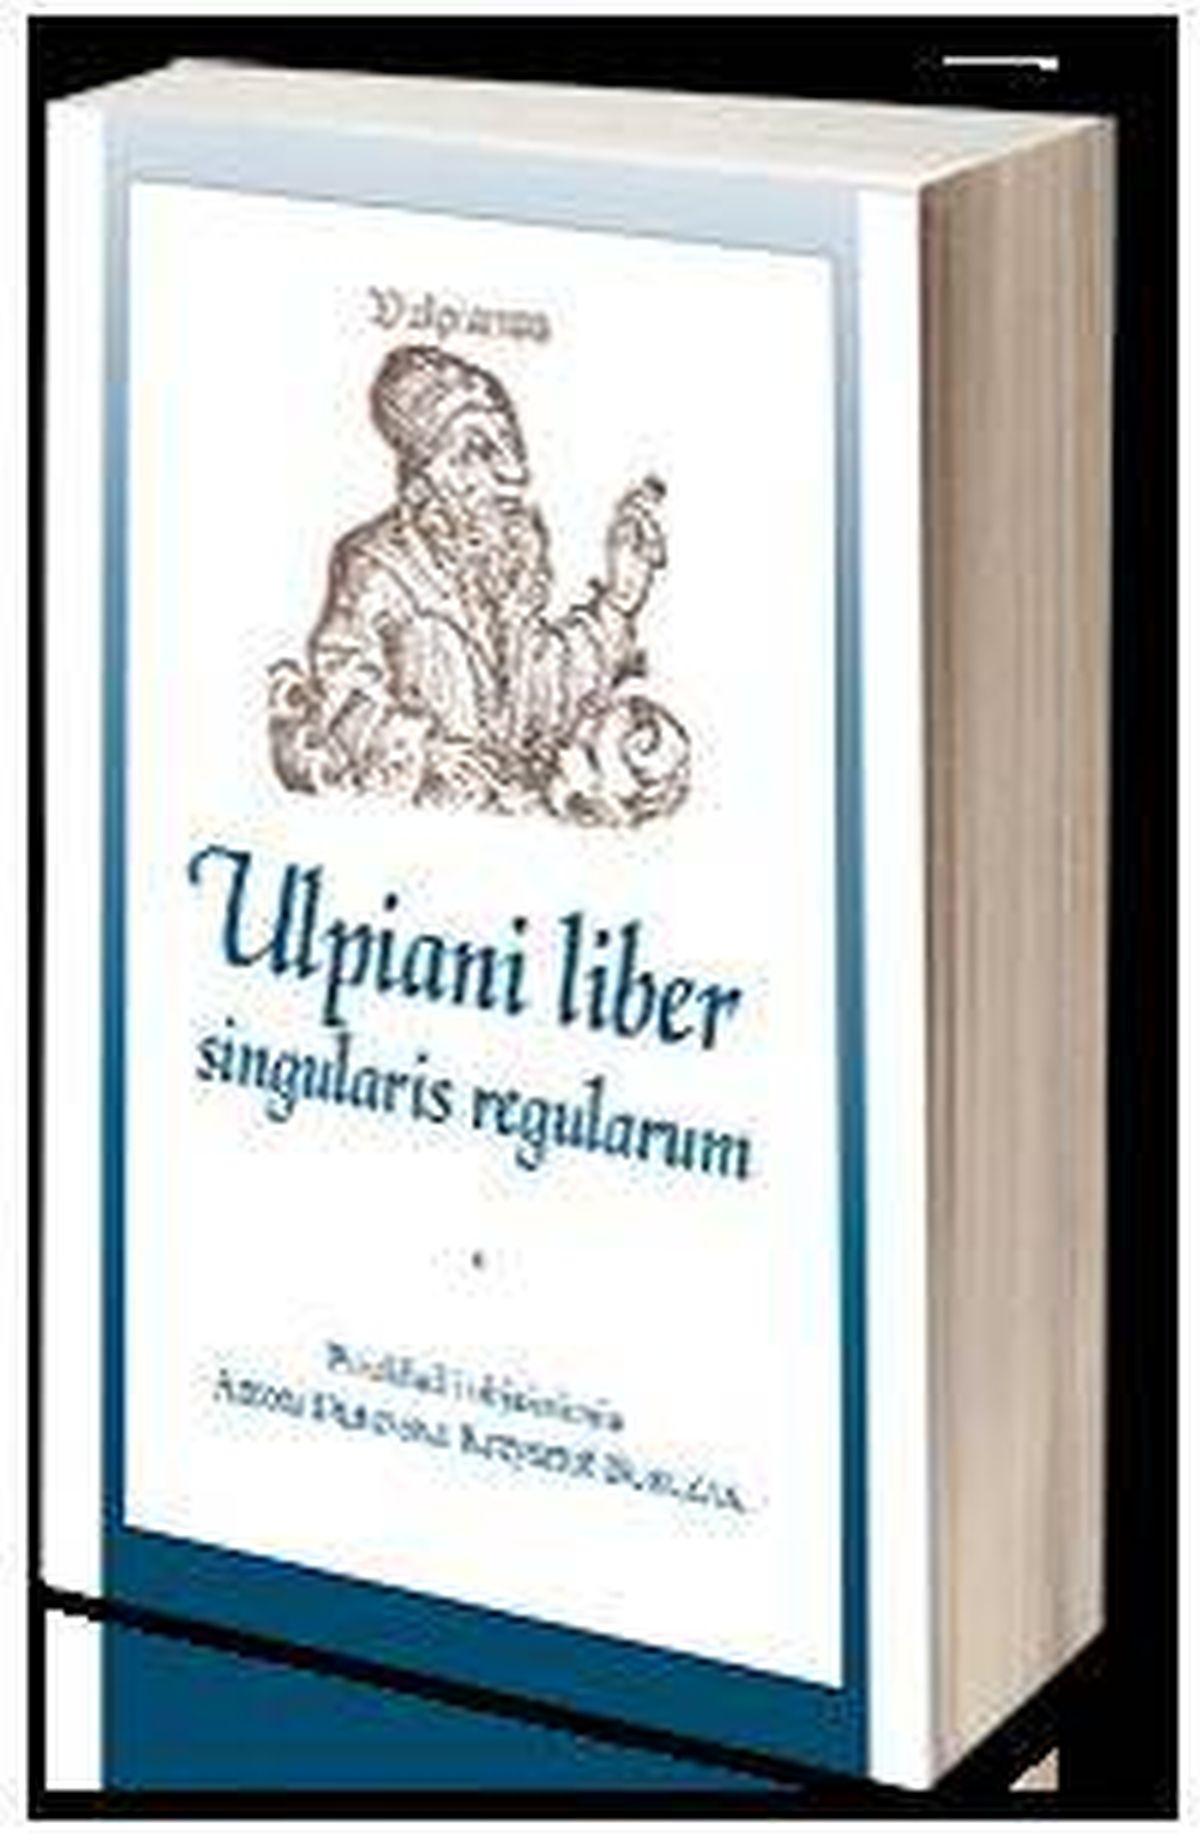 Ulpiani liber singularis regularum / Pojedyncza księga reguł Ulpiana